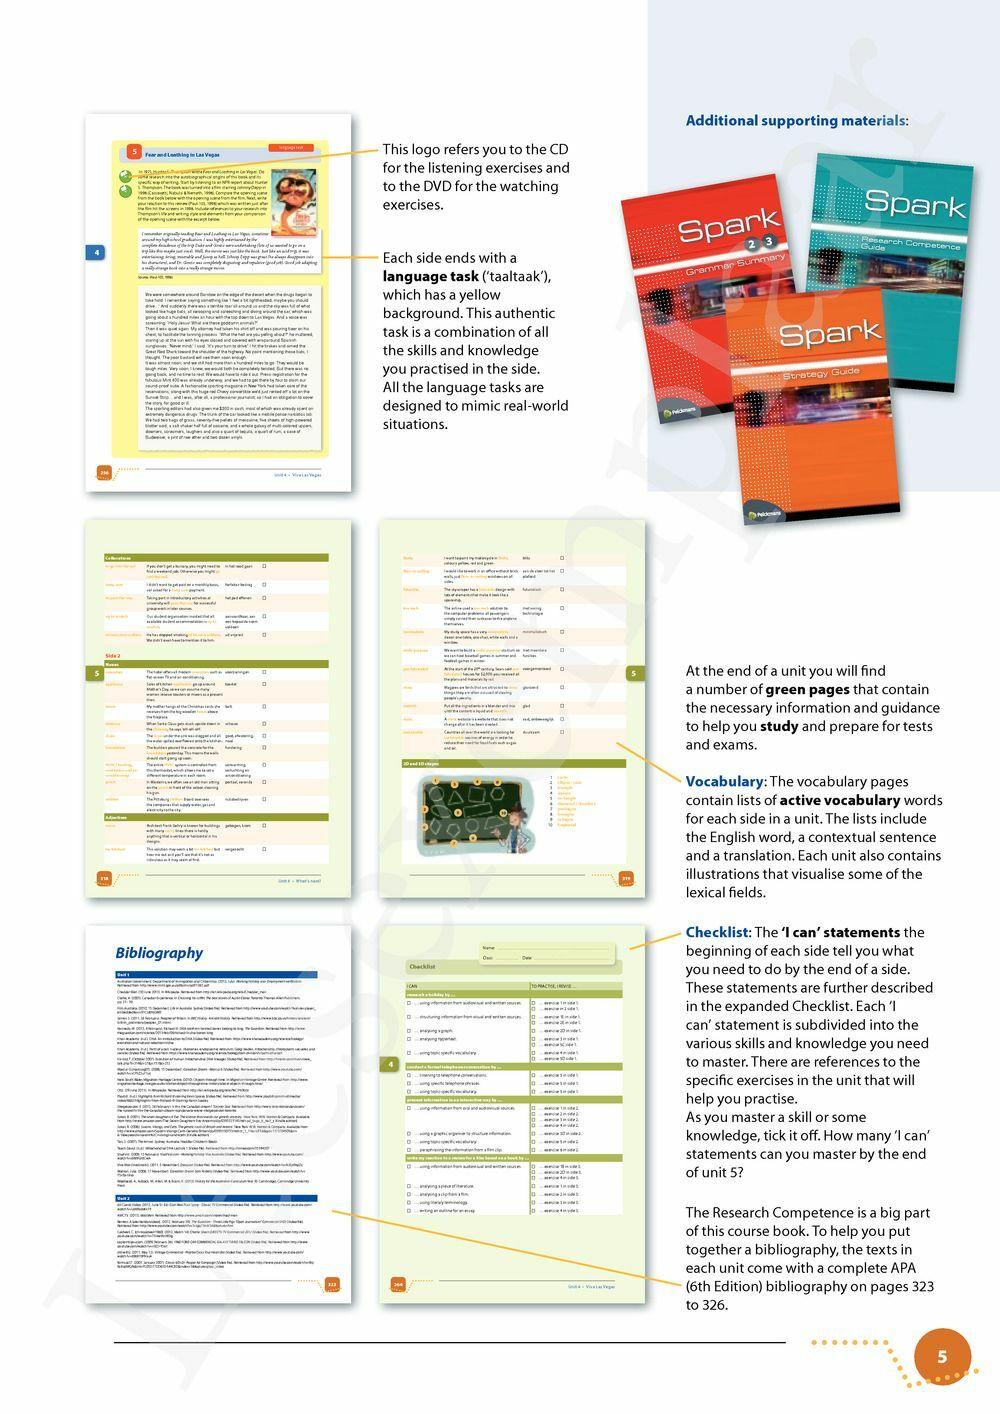 Spark 4 Workbook Answers Page 46 / Microservice Patterns Meap Pdf ...